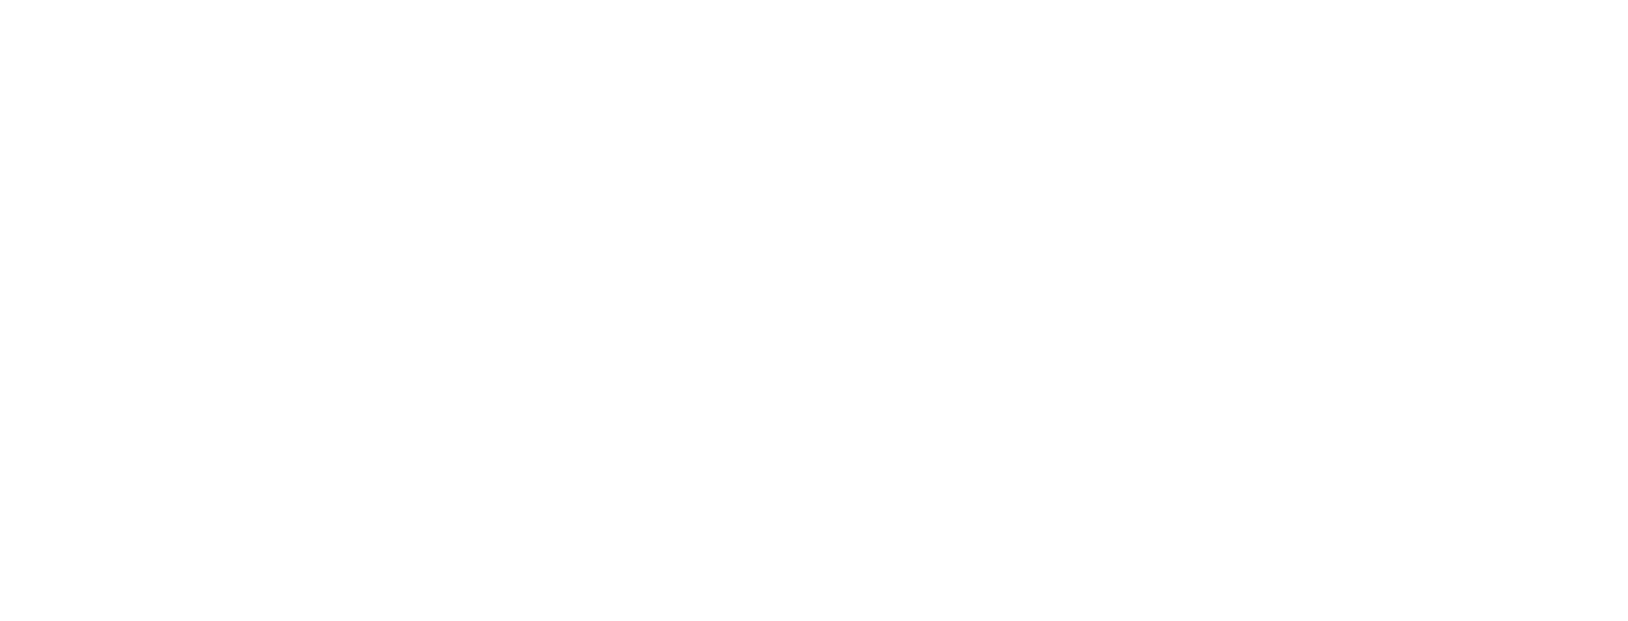 YorkInstallConfidenceEnglishWhite.png